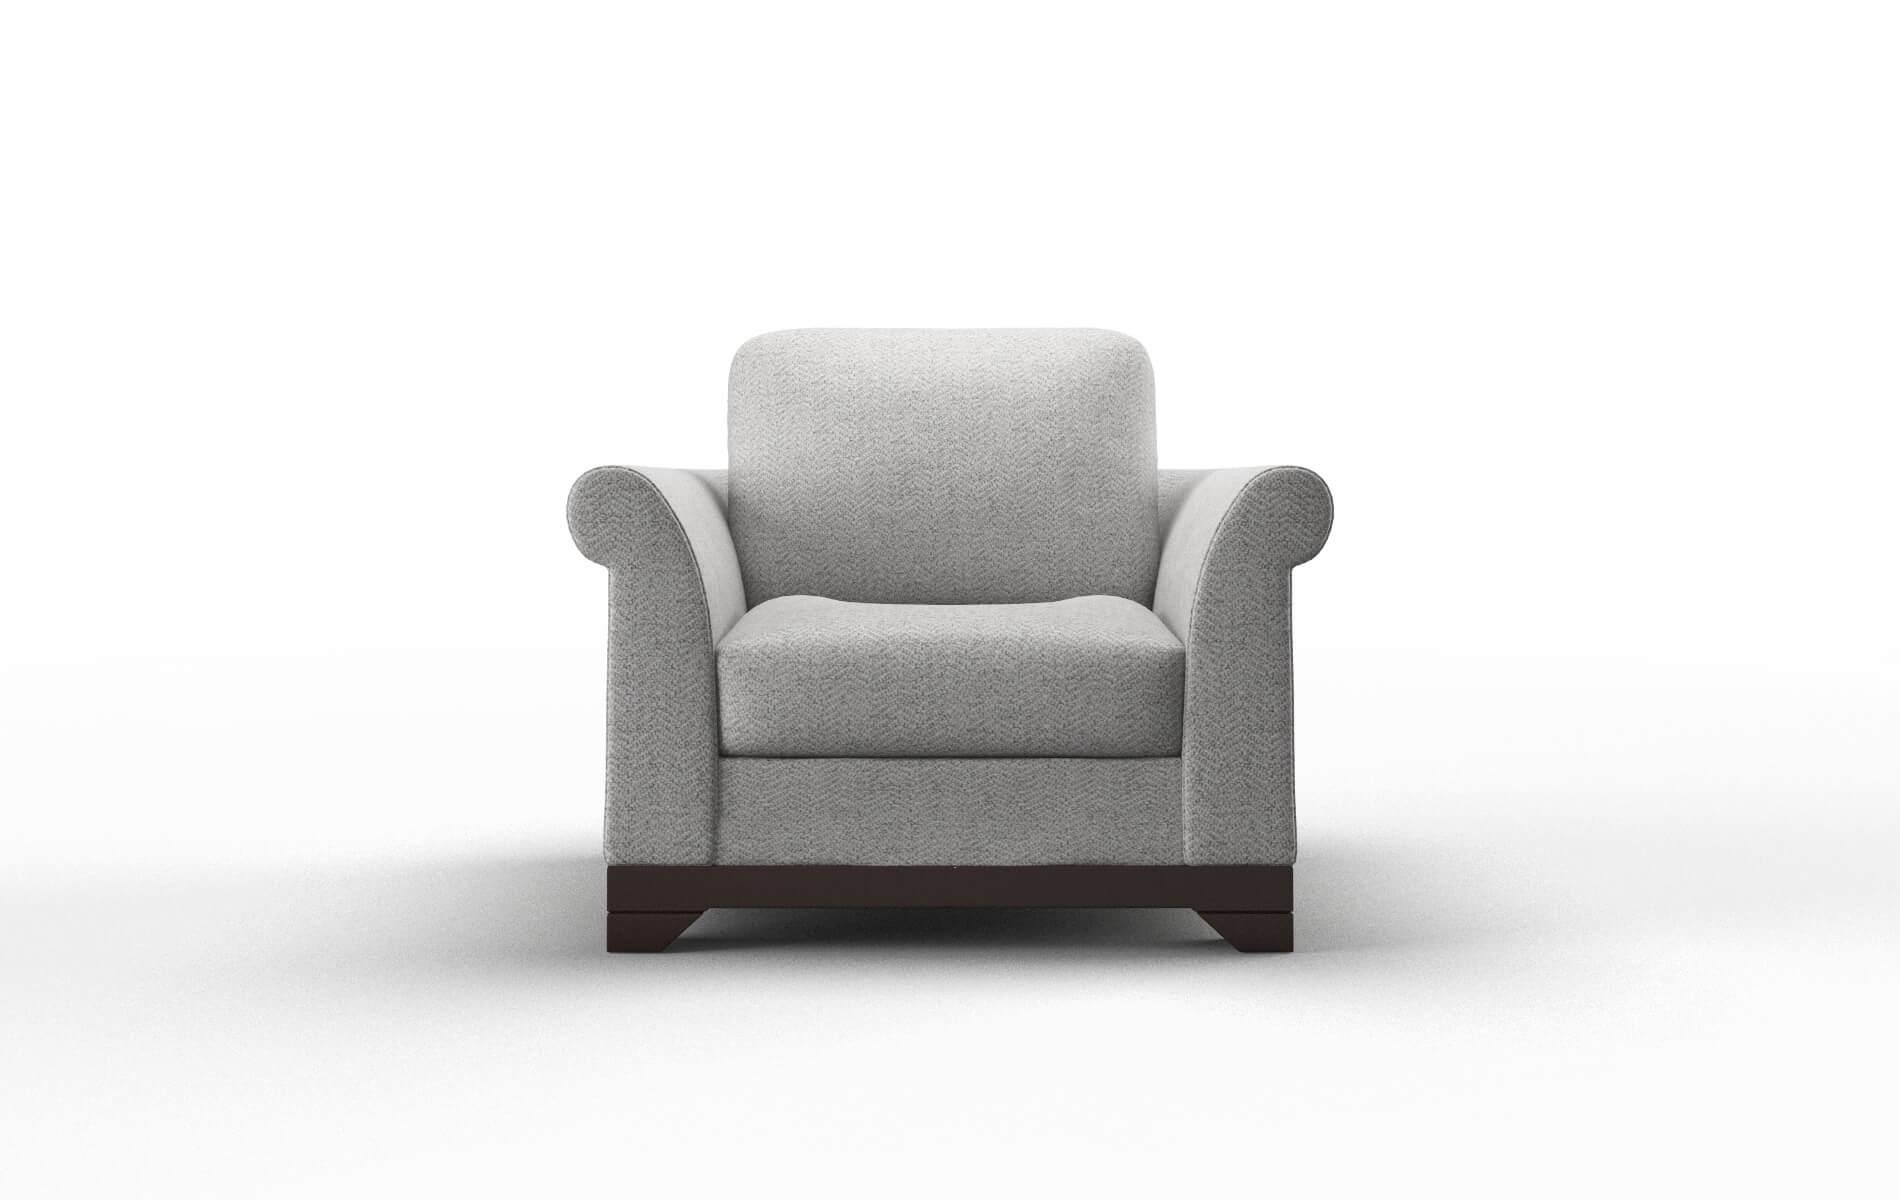 Denver Catalina Silver chair espresso legs